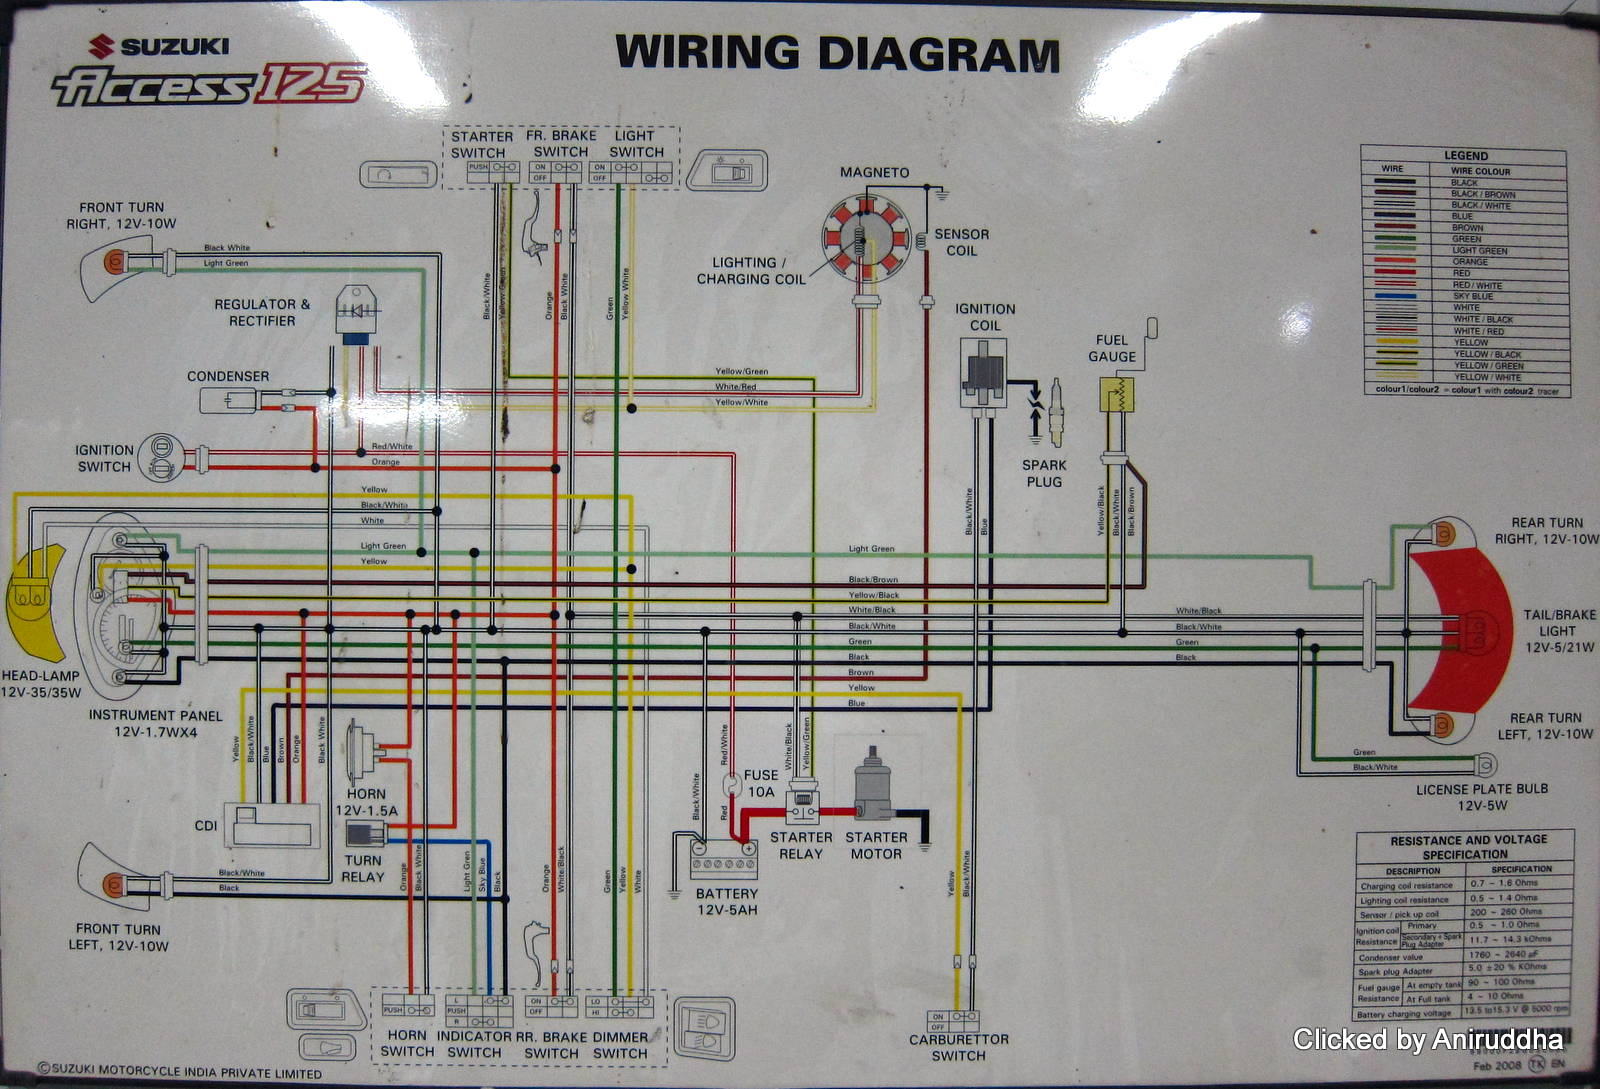 ye_6390] suzuki access 125 wiring diagram download diagram  sospe xeira attr dome carn vira mohammedshrine librar wiring 101